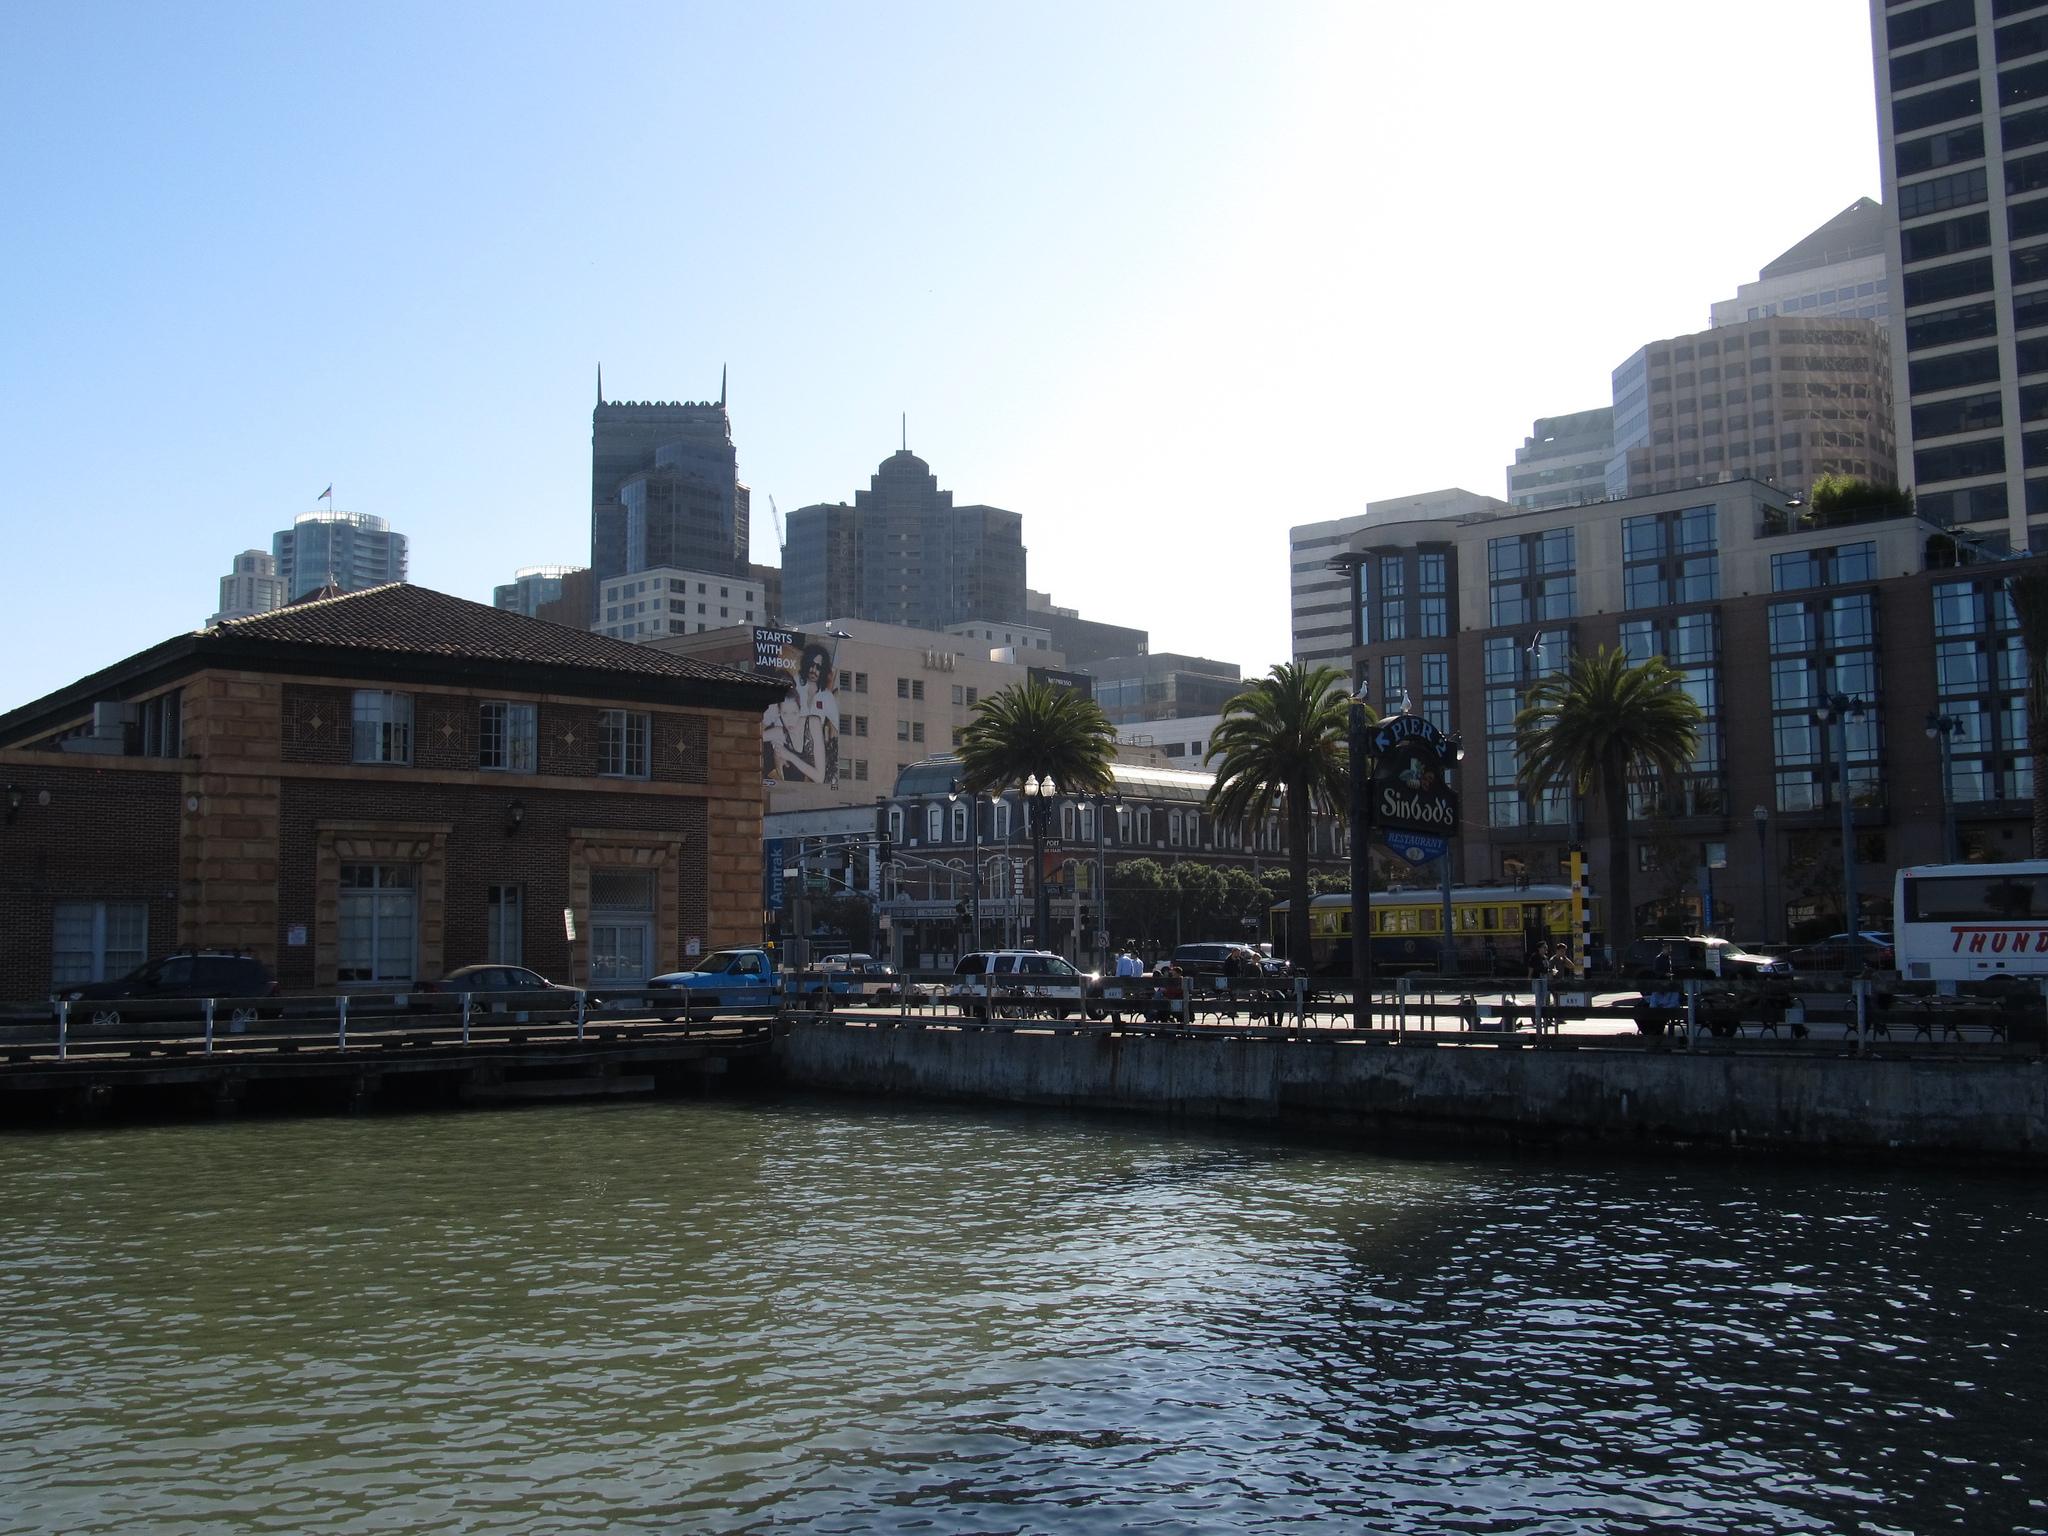 The San Francisco waterfront.